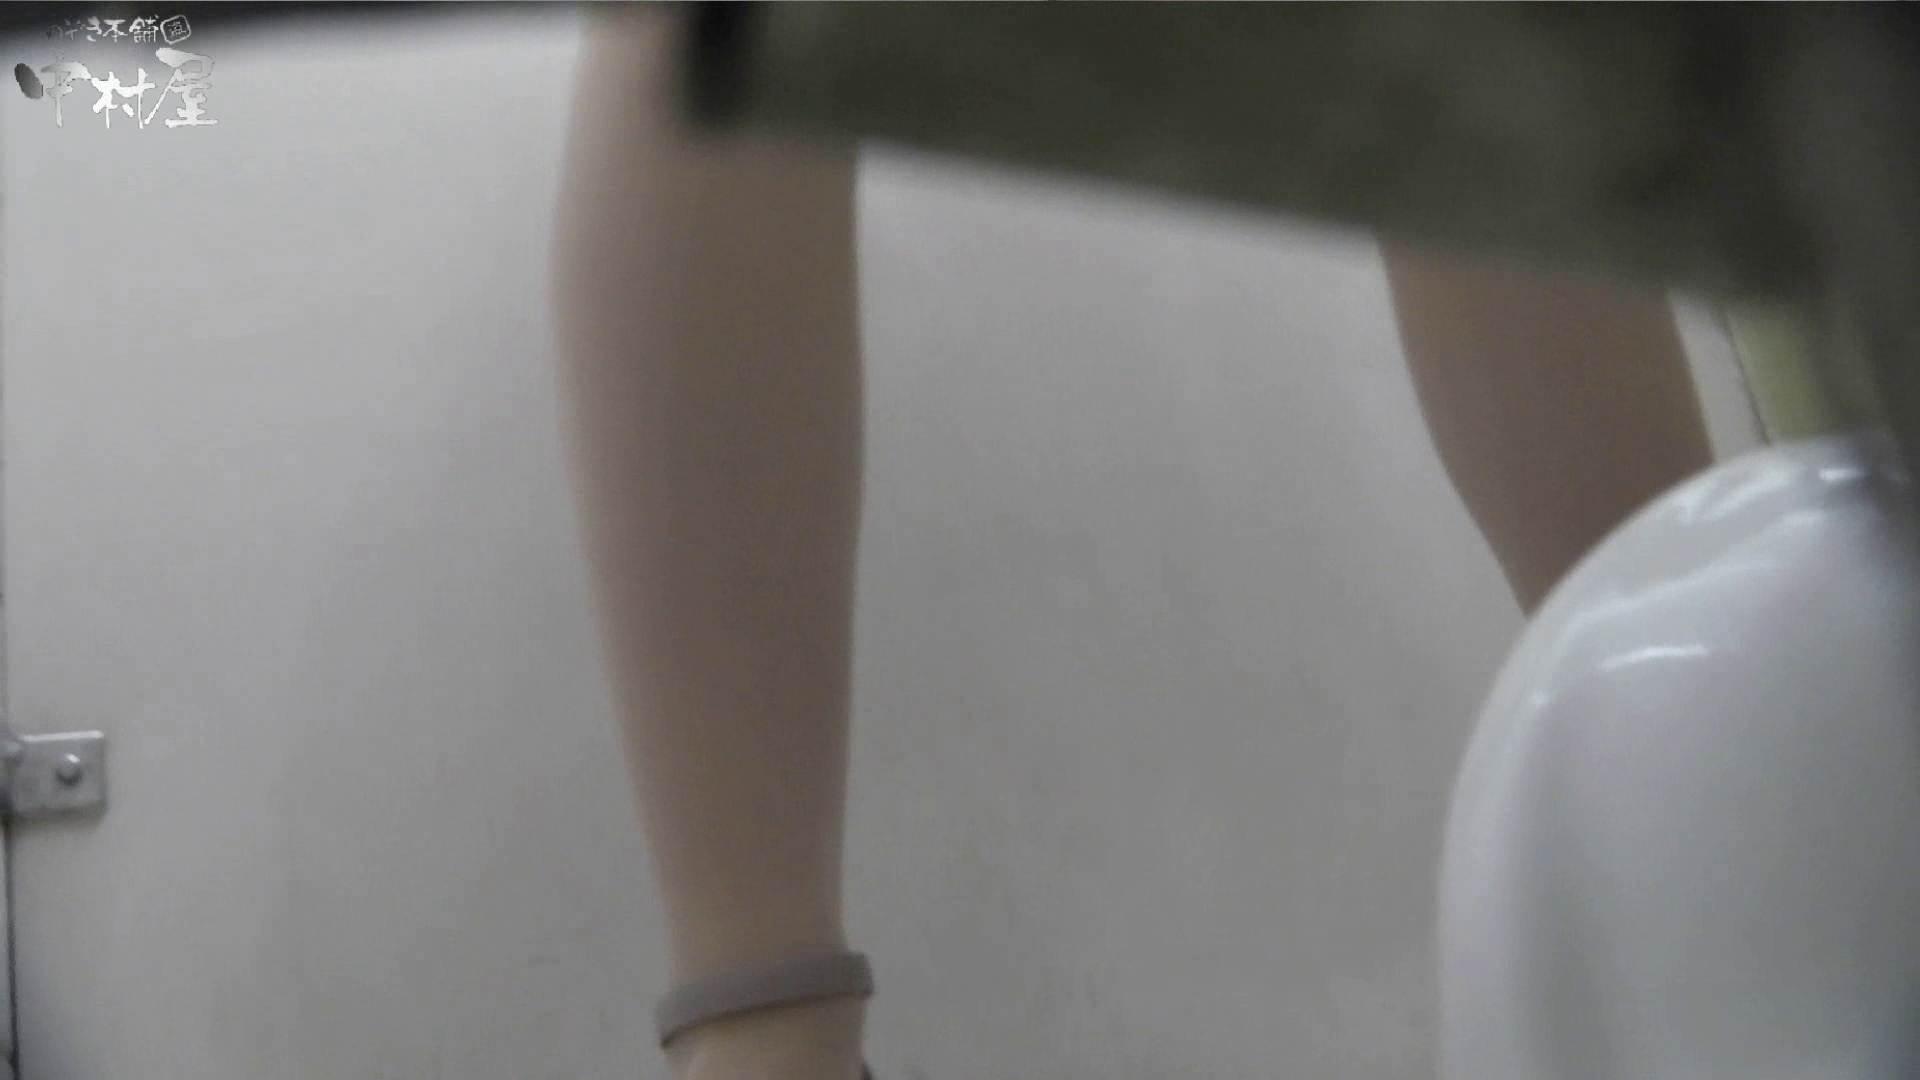 vol.30 命がけ潜伏洗面所! イボさん 後編 潜入 隠し撮りオマンコ動画紹介 78連発 10